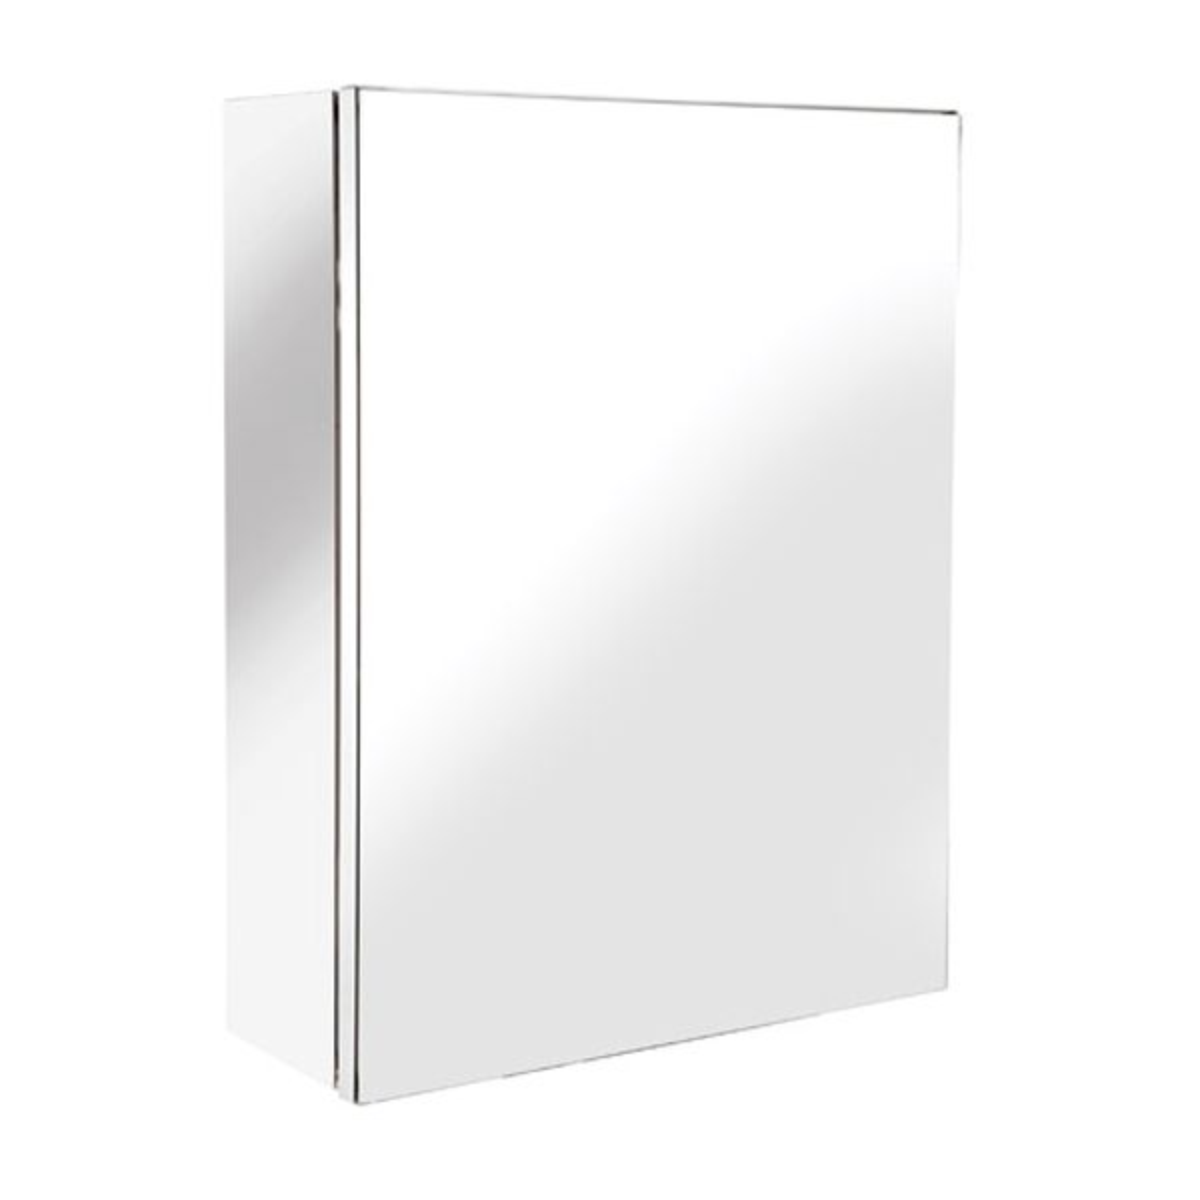 croydex-avon-stainless-steel-bathroom-cabinet.jpg